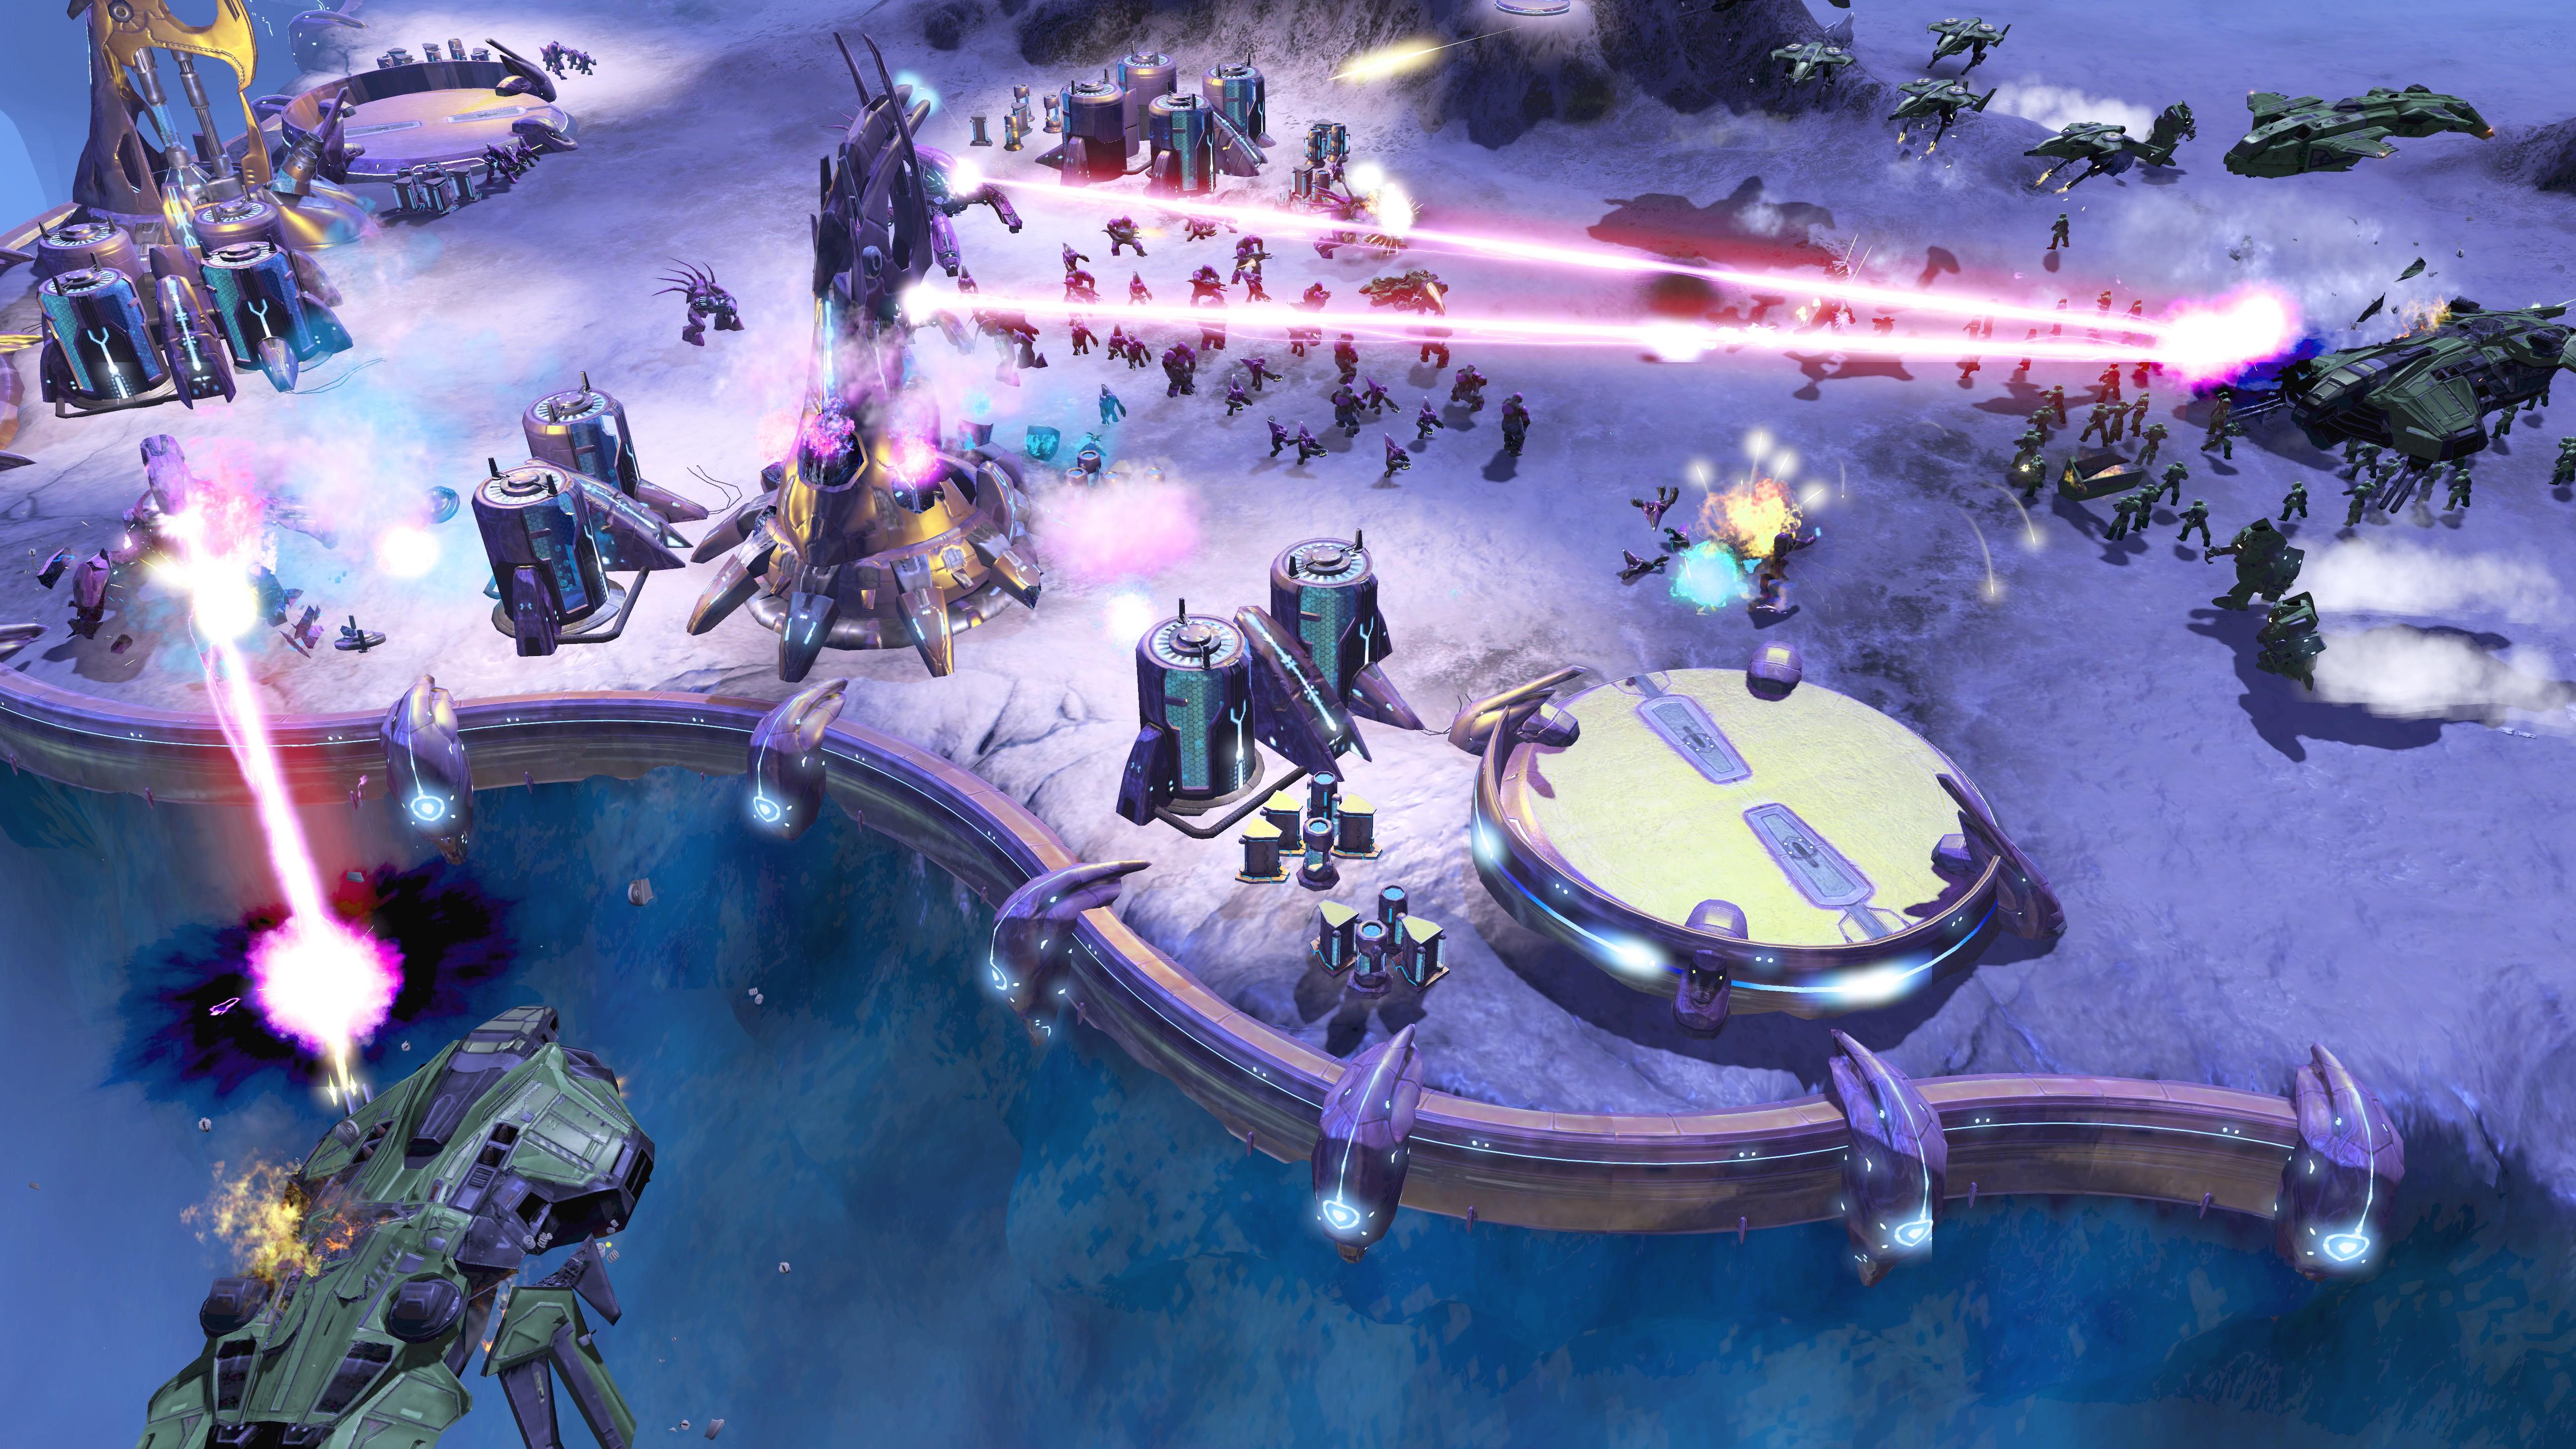 Halo Wars - Demo Gameplay